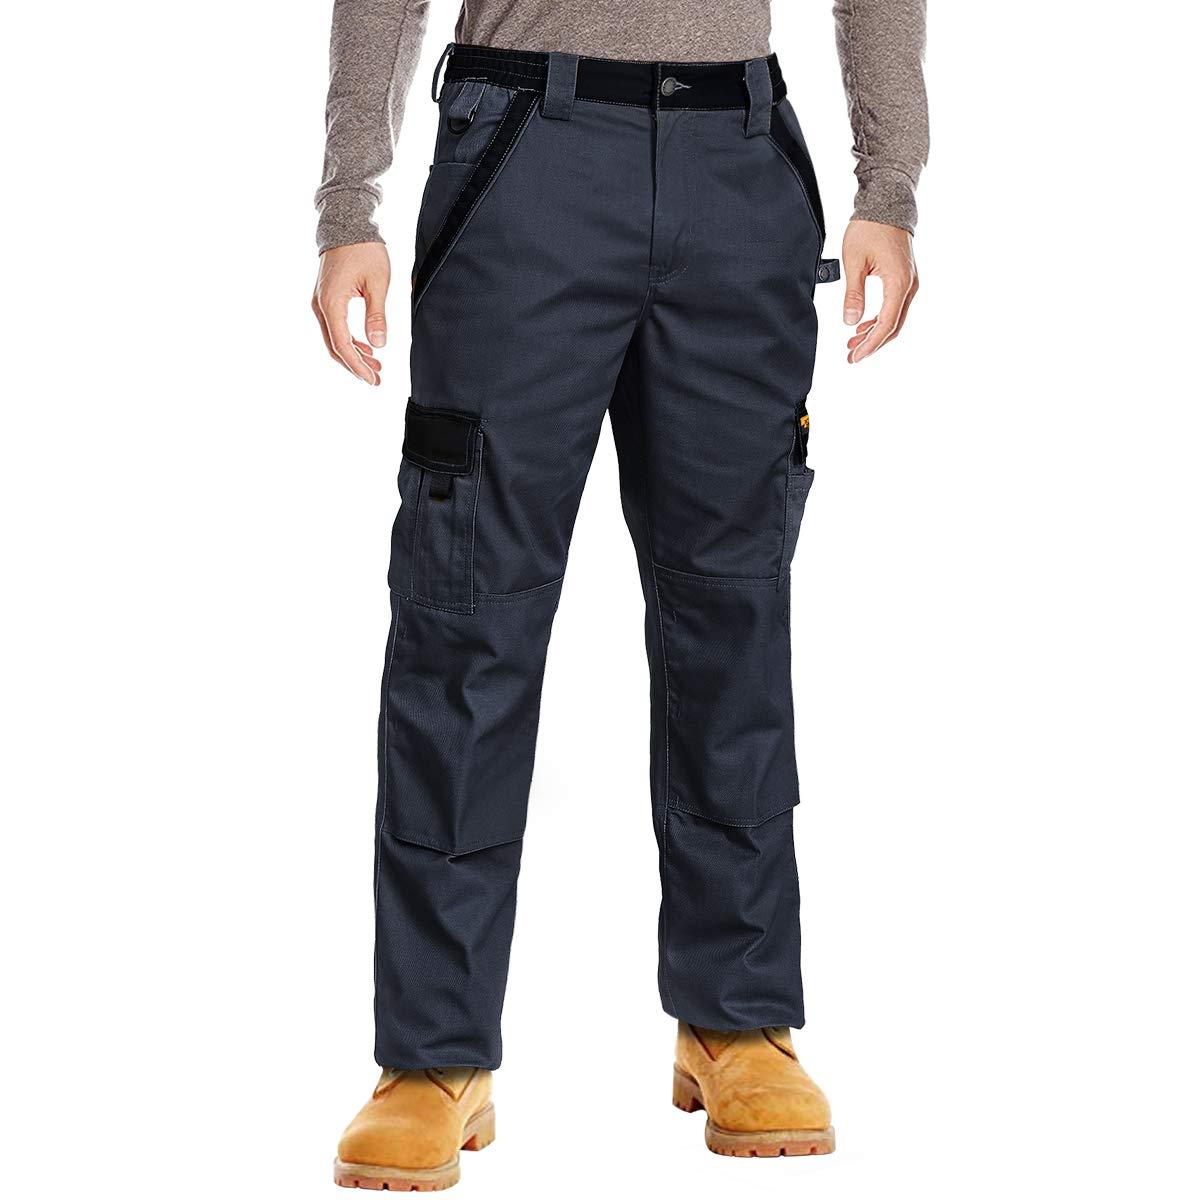 DuraDrive 32W x 32L Timber Two Tone Tradesman Pants